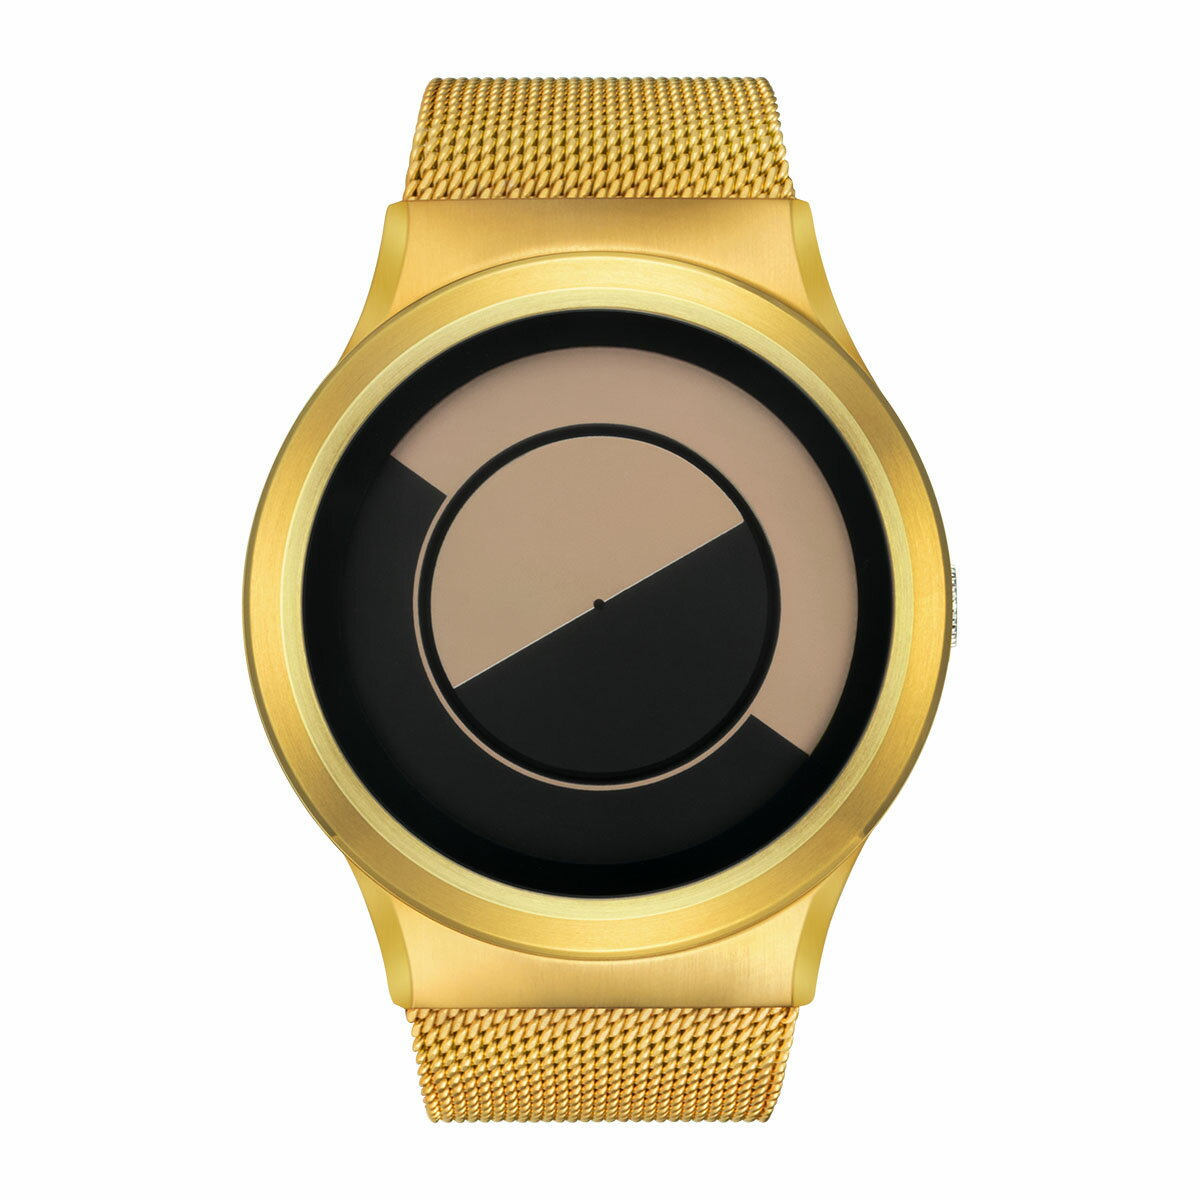 ZEROO QUARTER MOON ゼロ 電池式クォーツ 腕時計 [W08033B04SM04] ベージュ デザインウォッチ ペア用 メンズ レディース ユニセックス おしゃれ時計 デザイナーズ